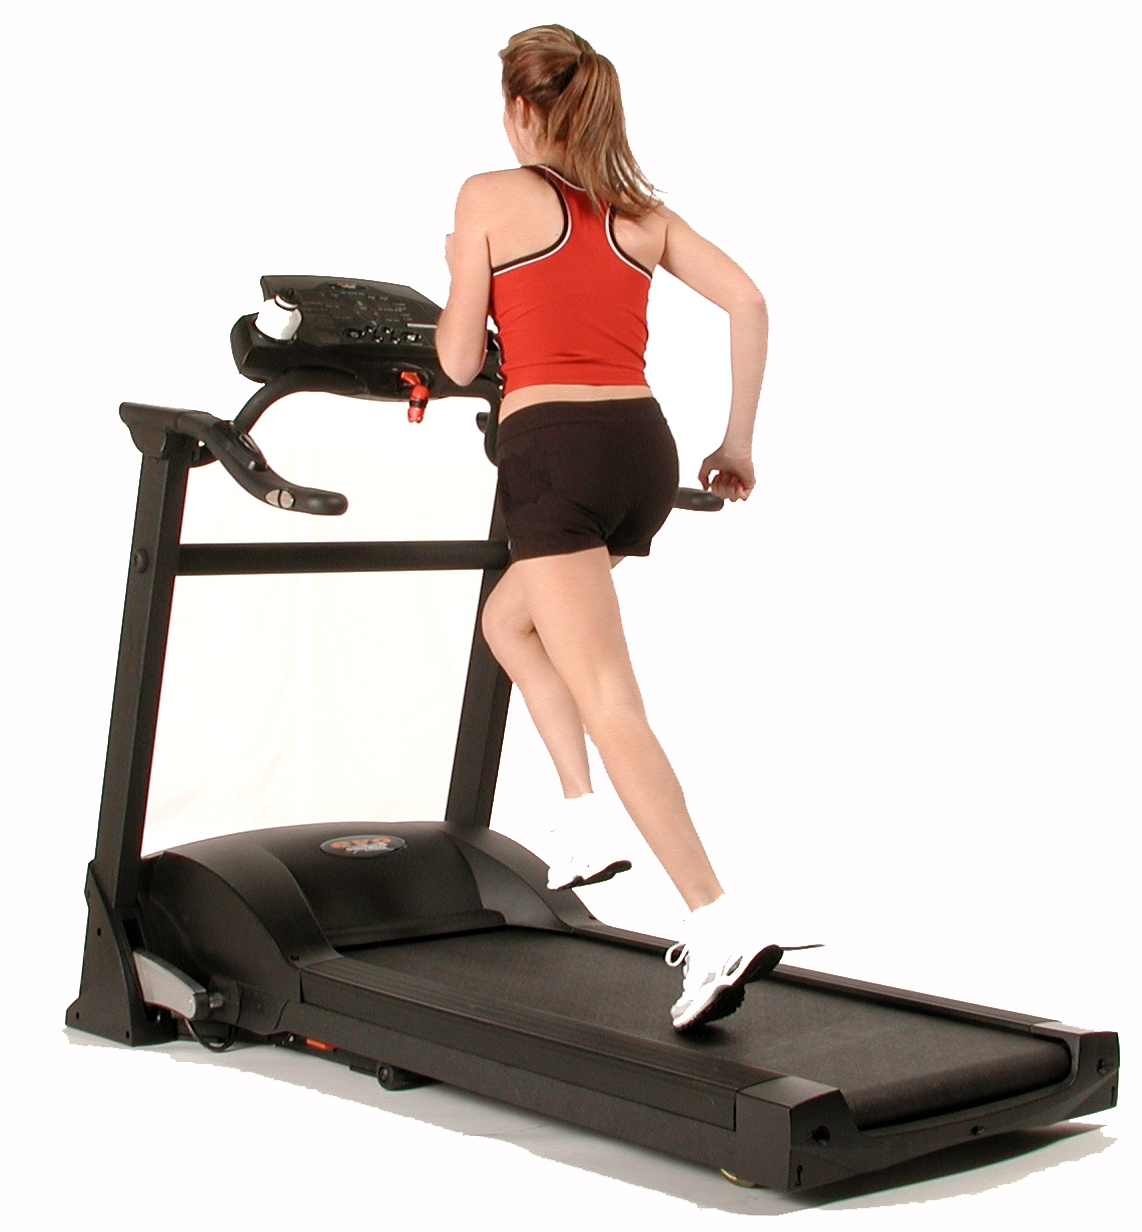 Choosing An Elliptical Machine for Home Workouts